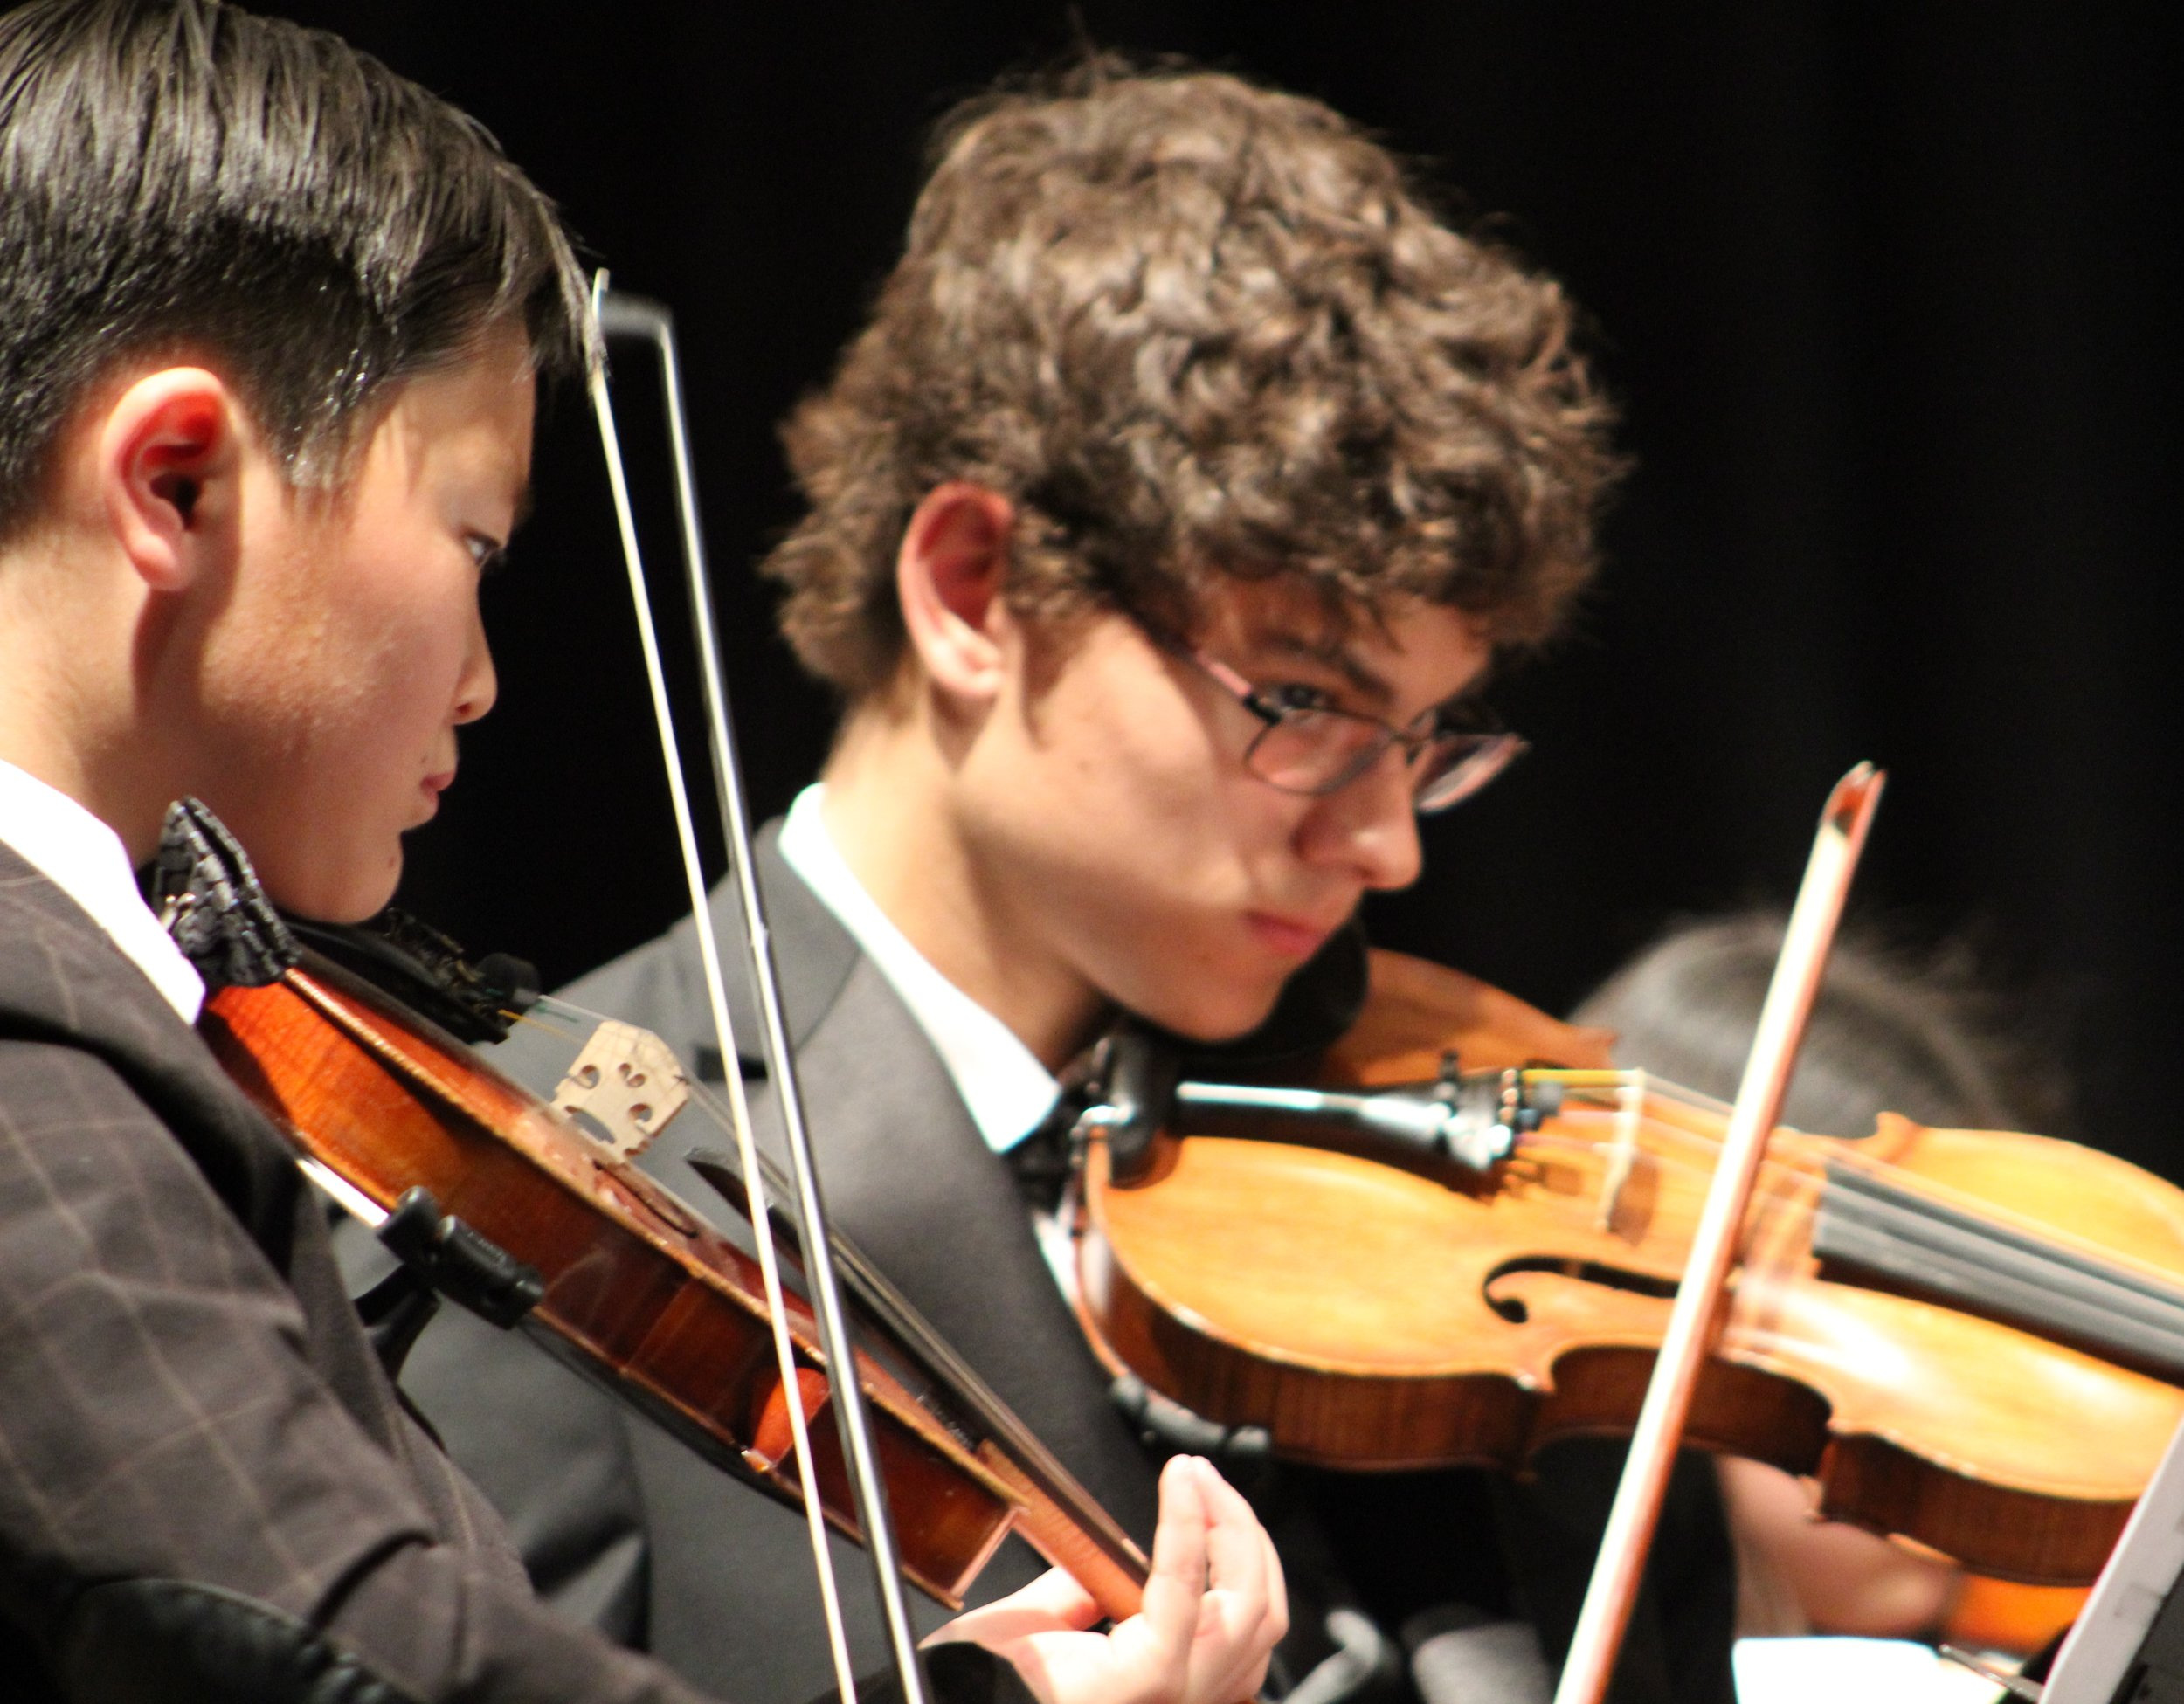 CHYS Spring Concert 6 violins JPG.jpg